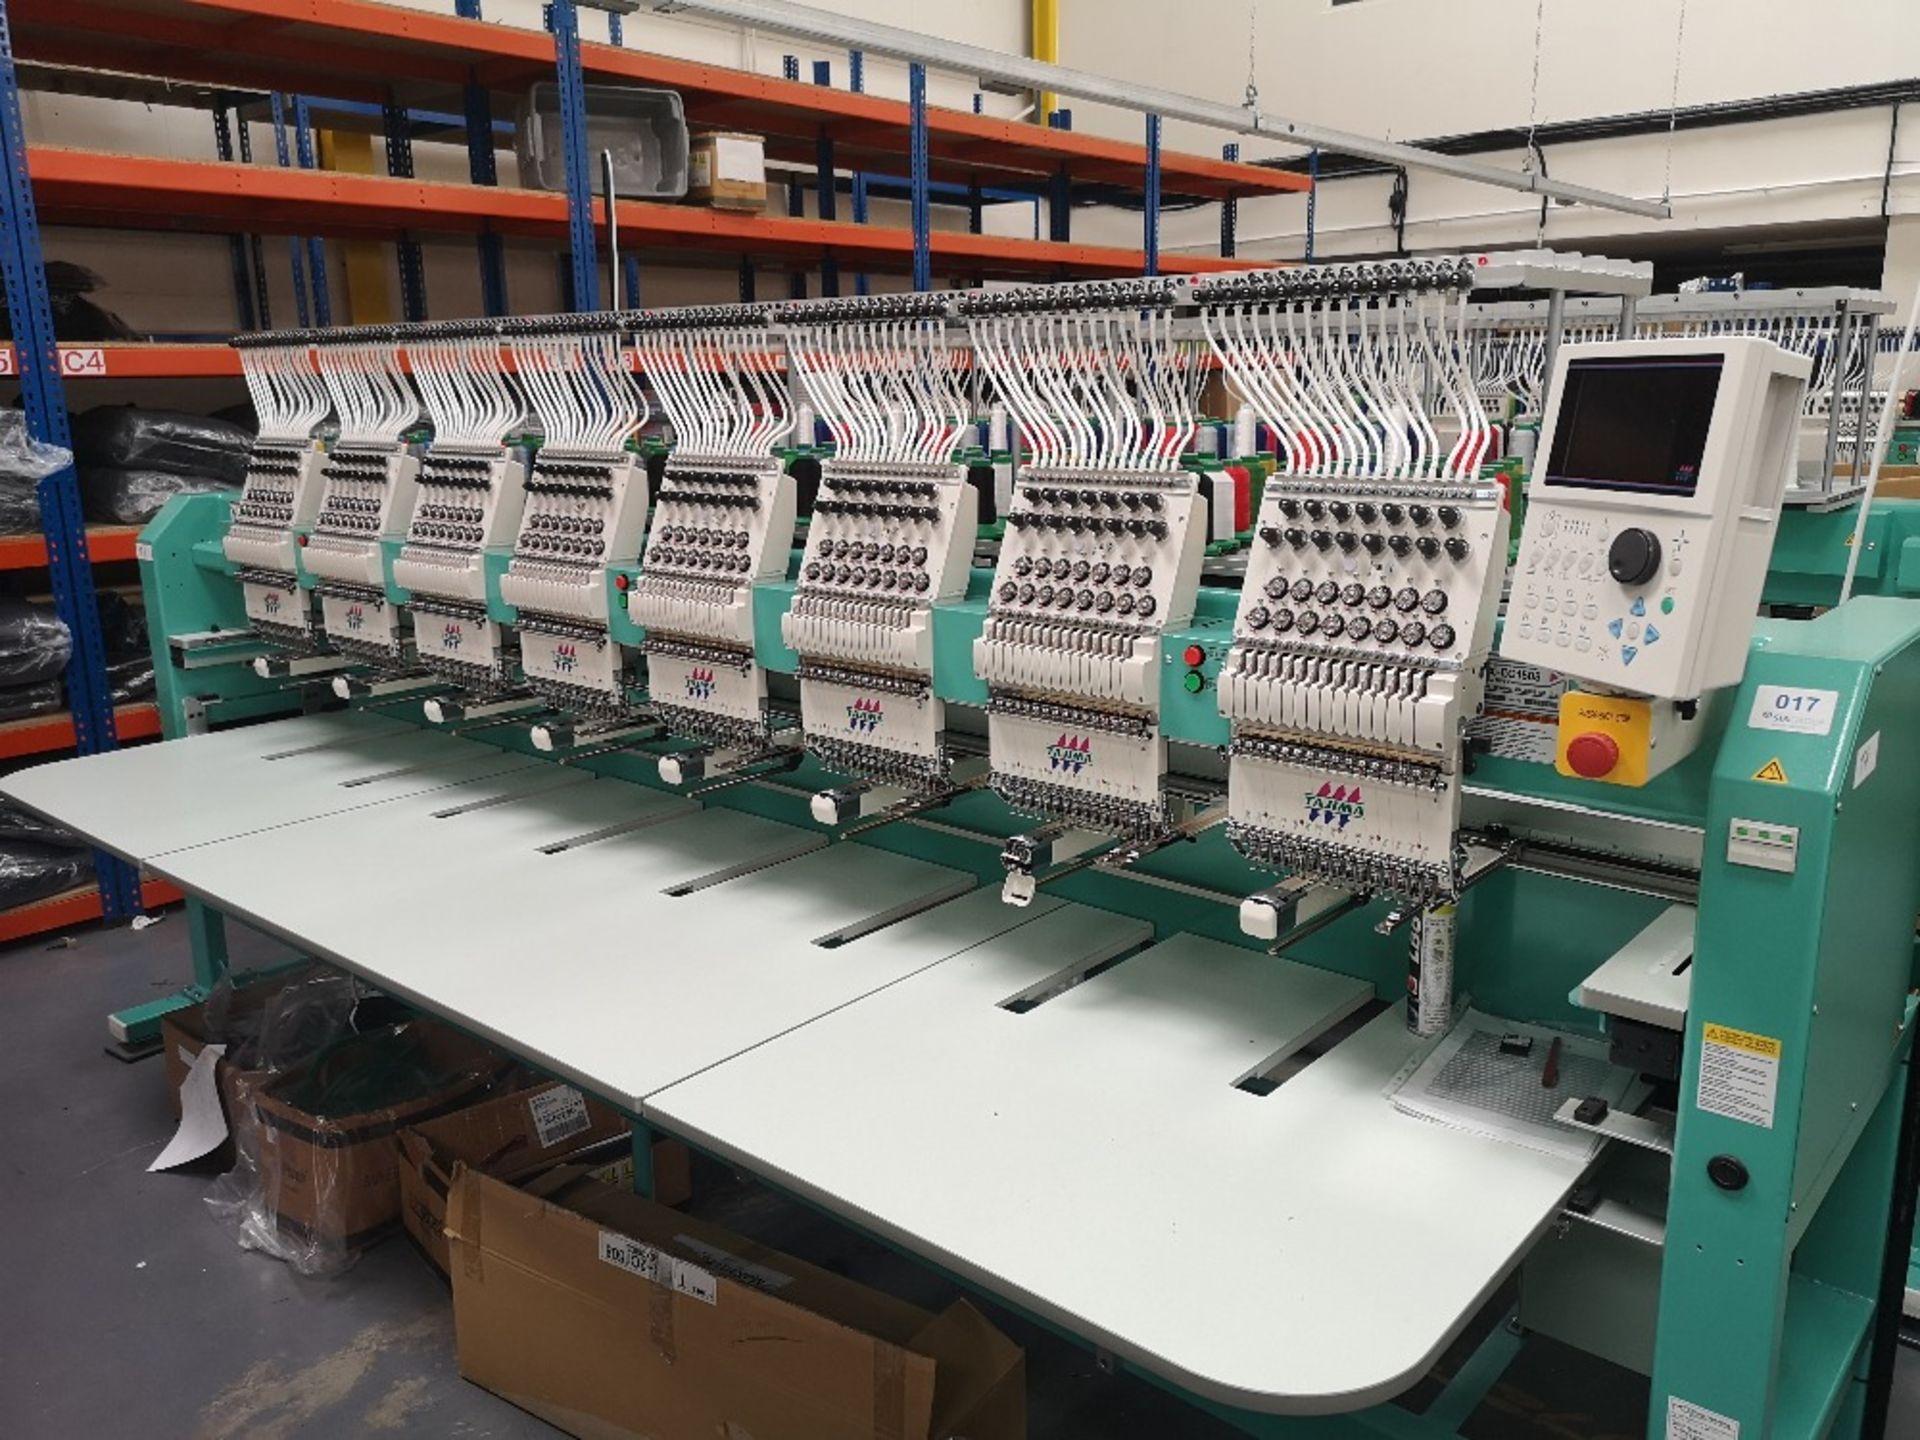 Tajima TFMX-II C1508 Electronic Multi Head Automatic Embroidery Machine (2017)